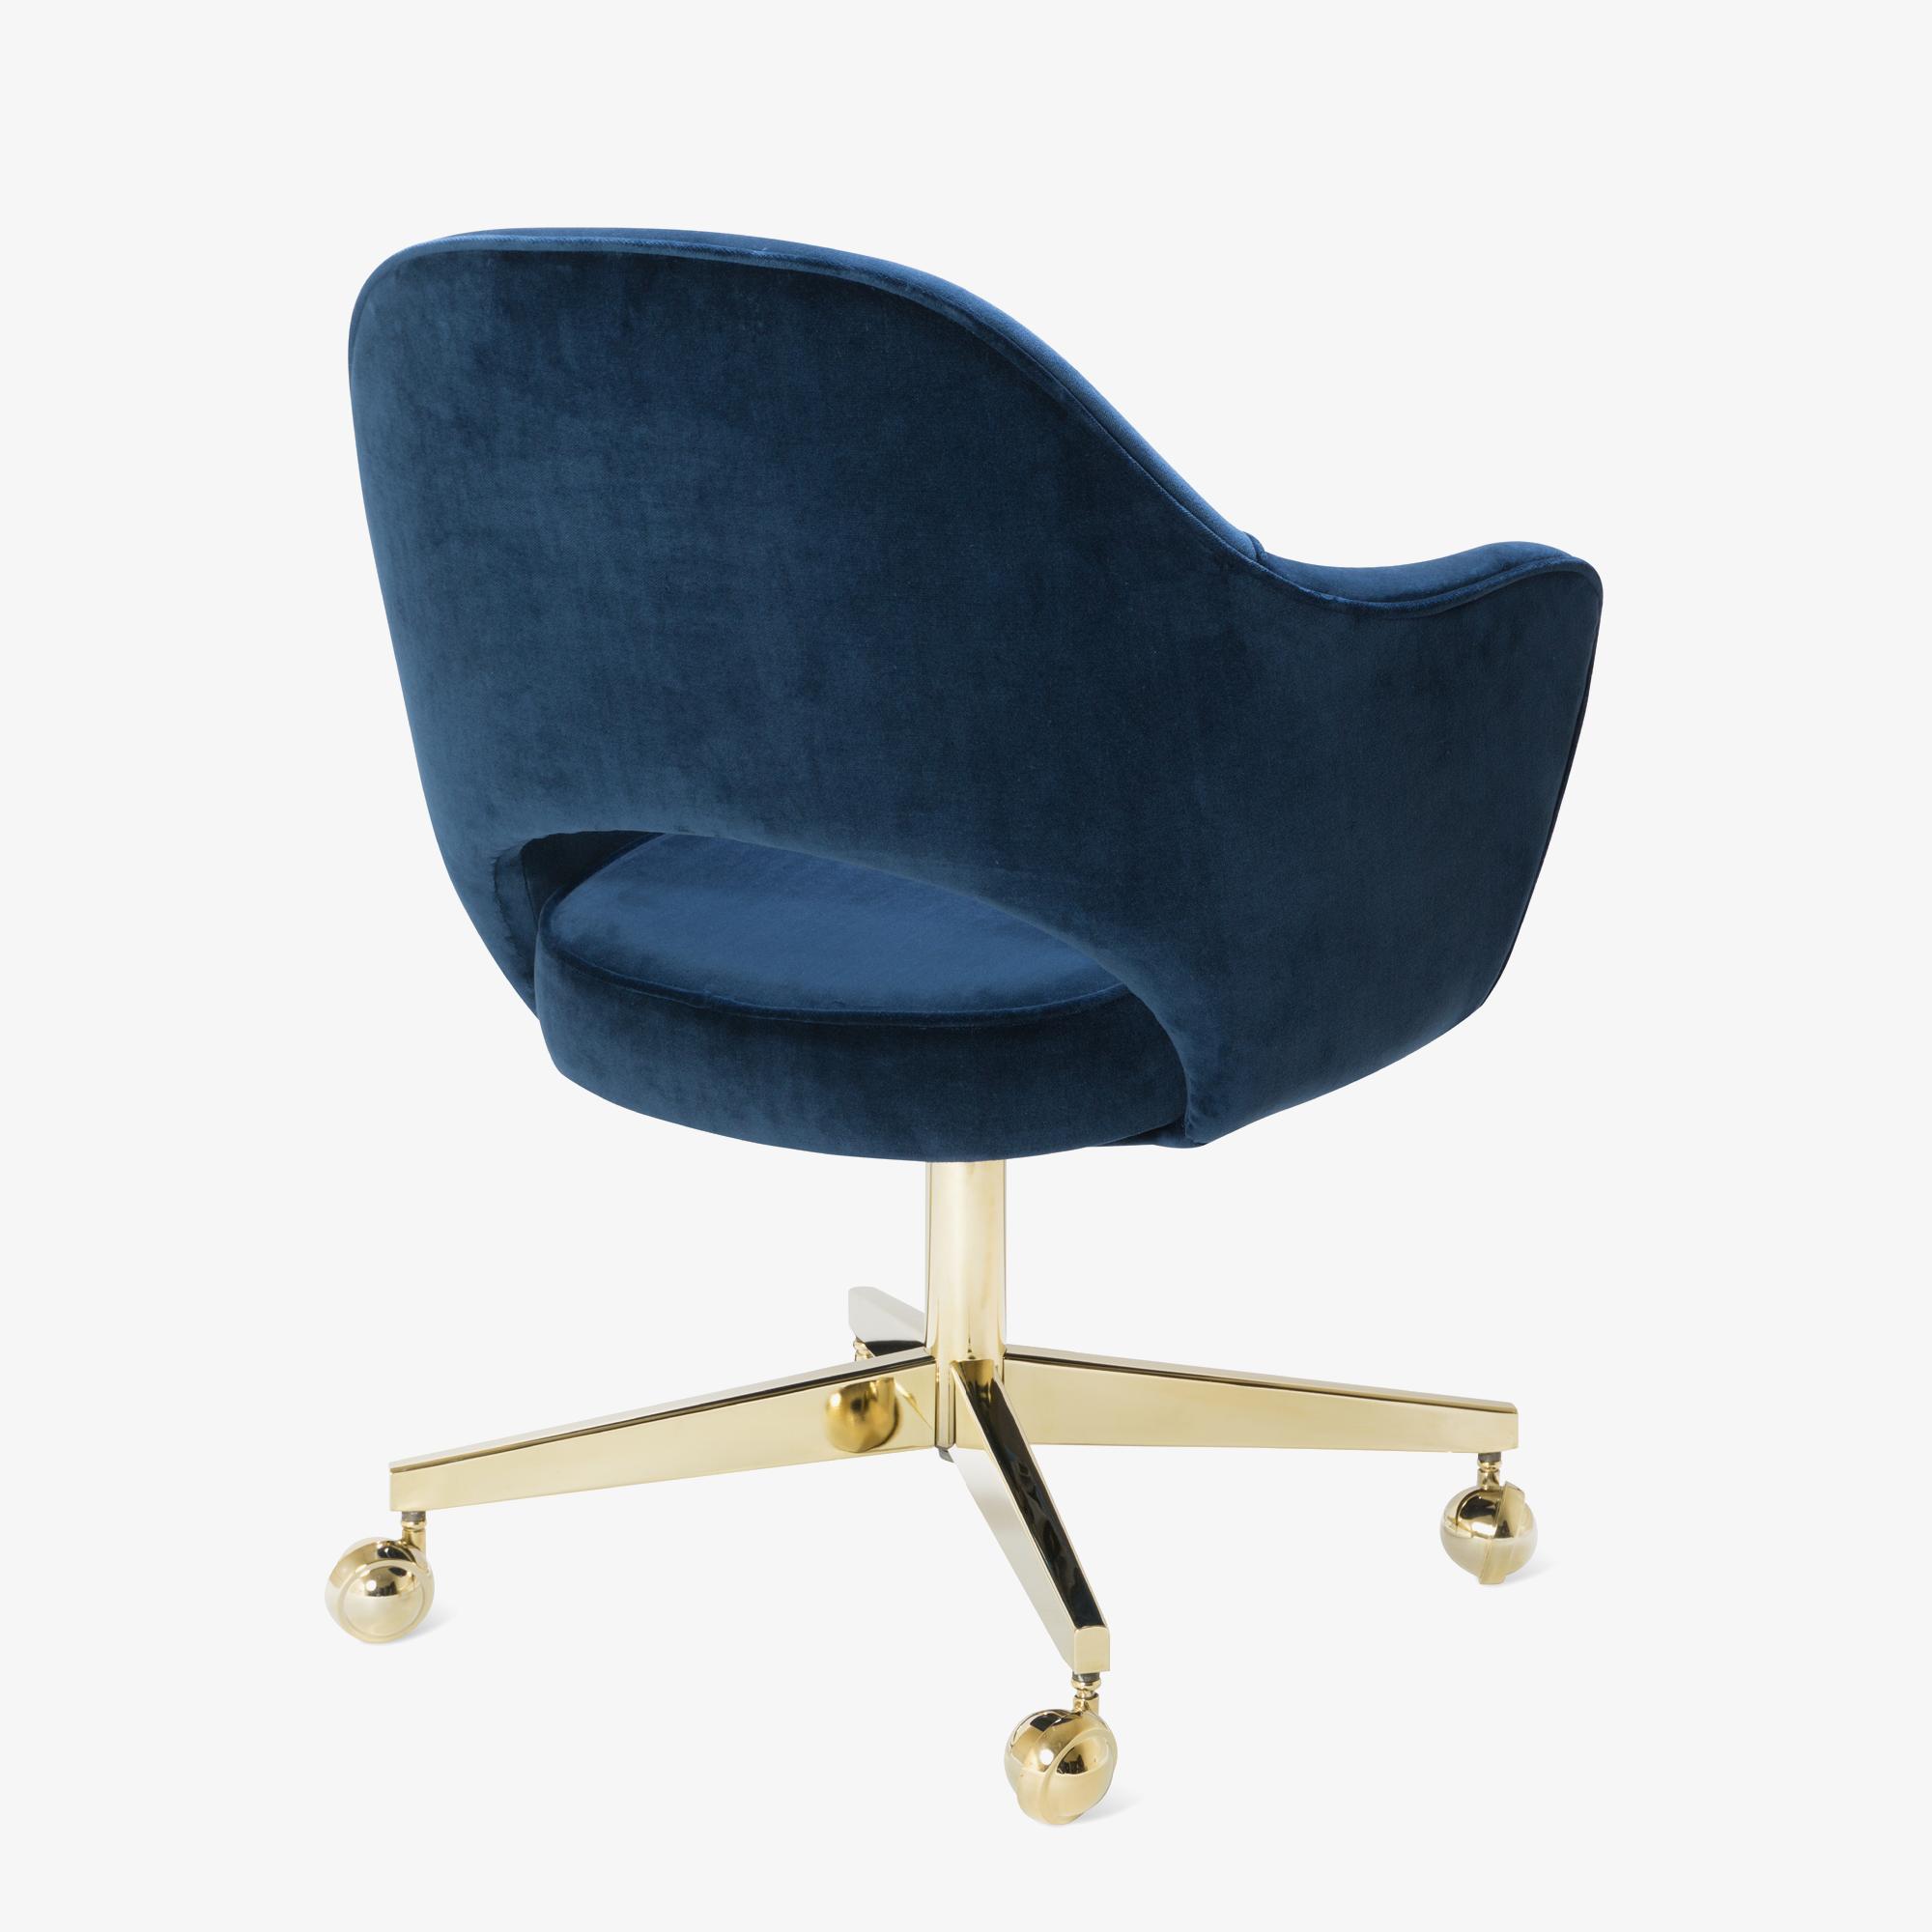 Saarinen Executive Arm Chair in Navy Velvet, Swivel Base, 24k Gold Edition5.png